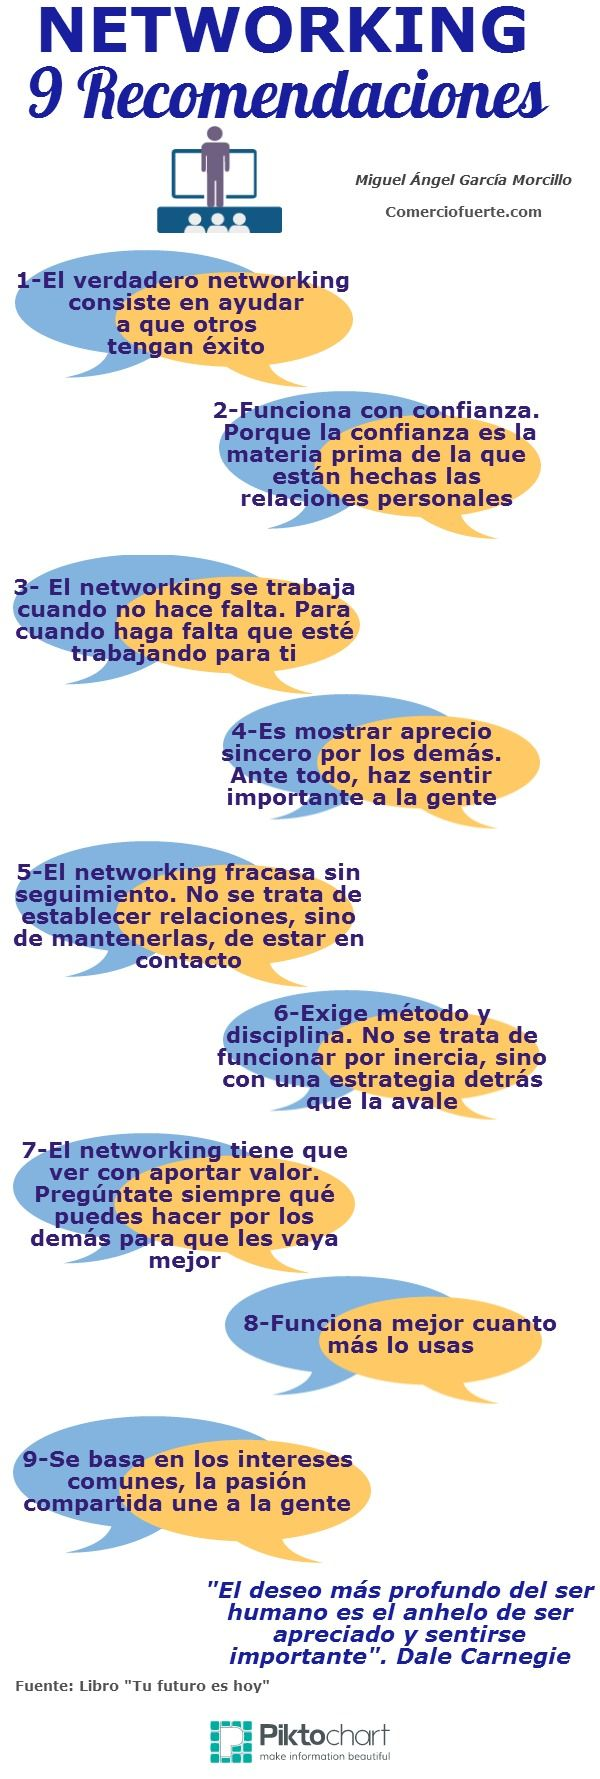 Infografia - Networking: 9 recomendaciones #infografia #infographic #marketing - TICs y Formación